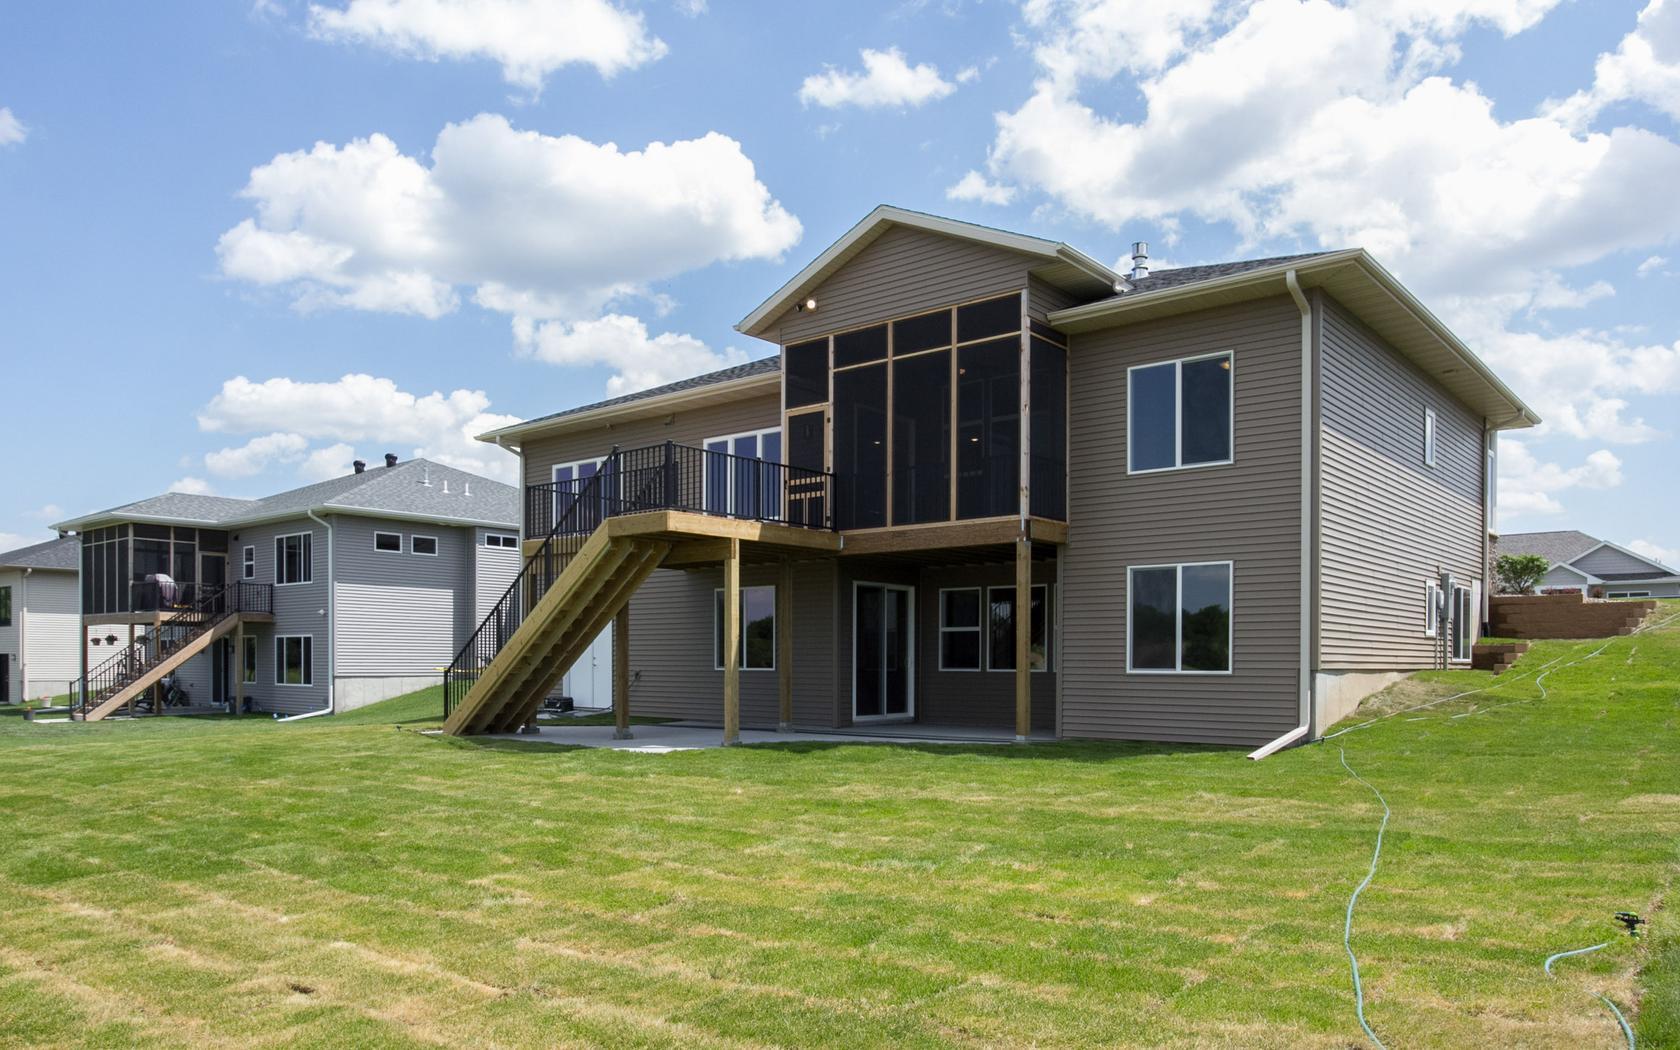 H&H Home Builders Exterior Design Image #41